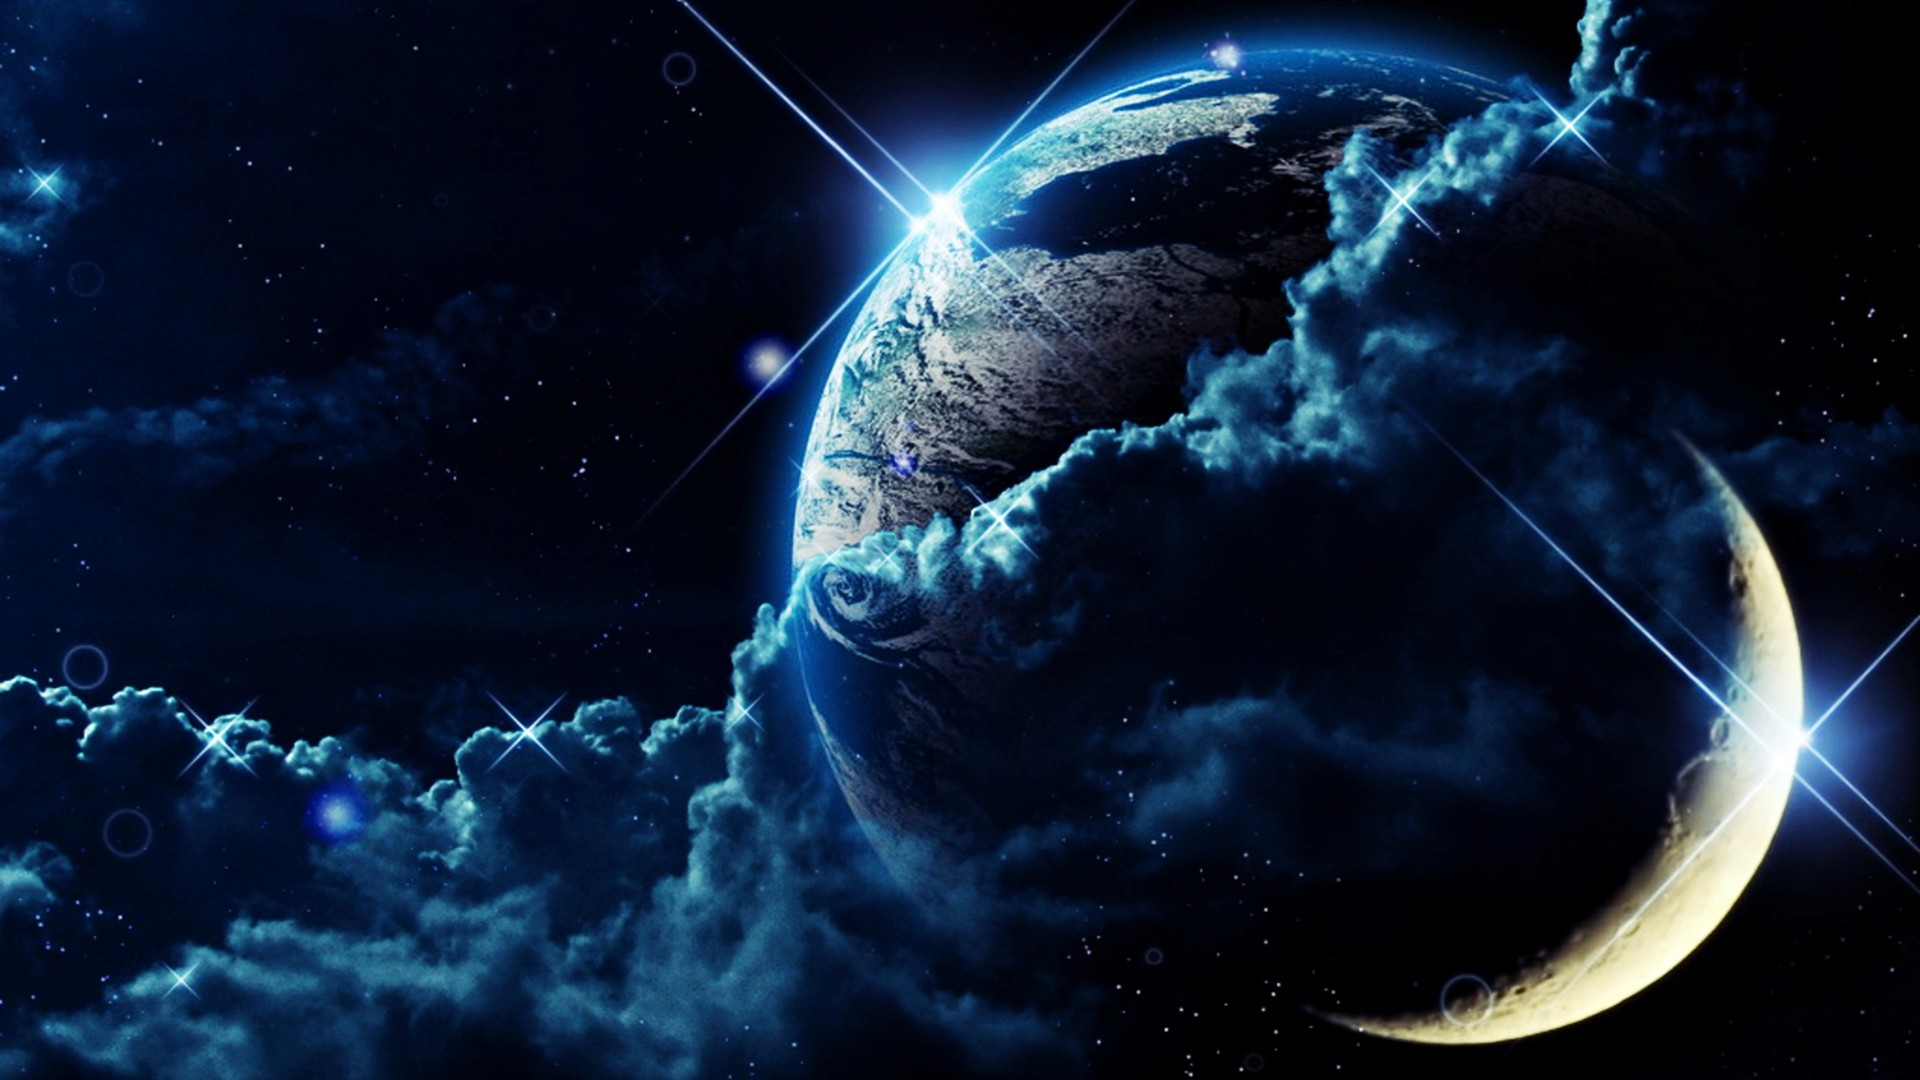 … earth wallpaper hd iphone biginf …